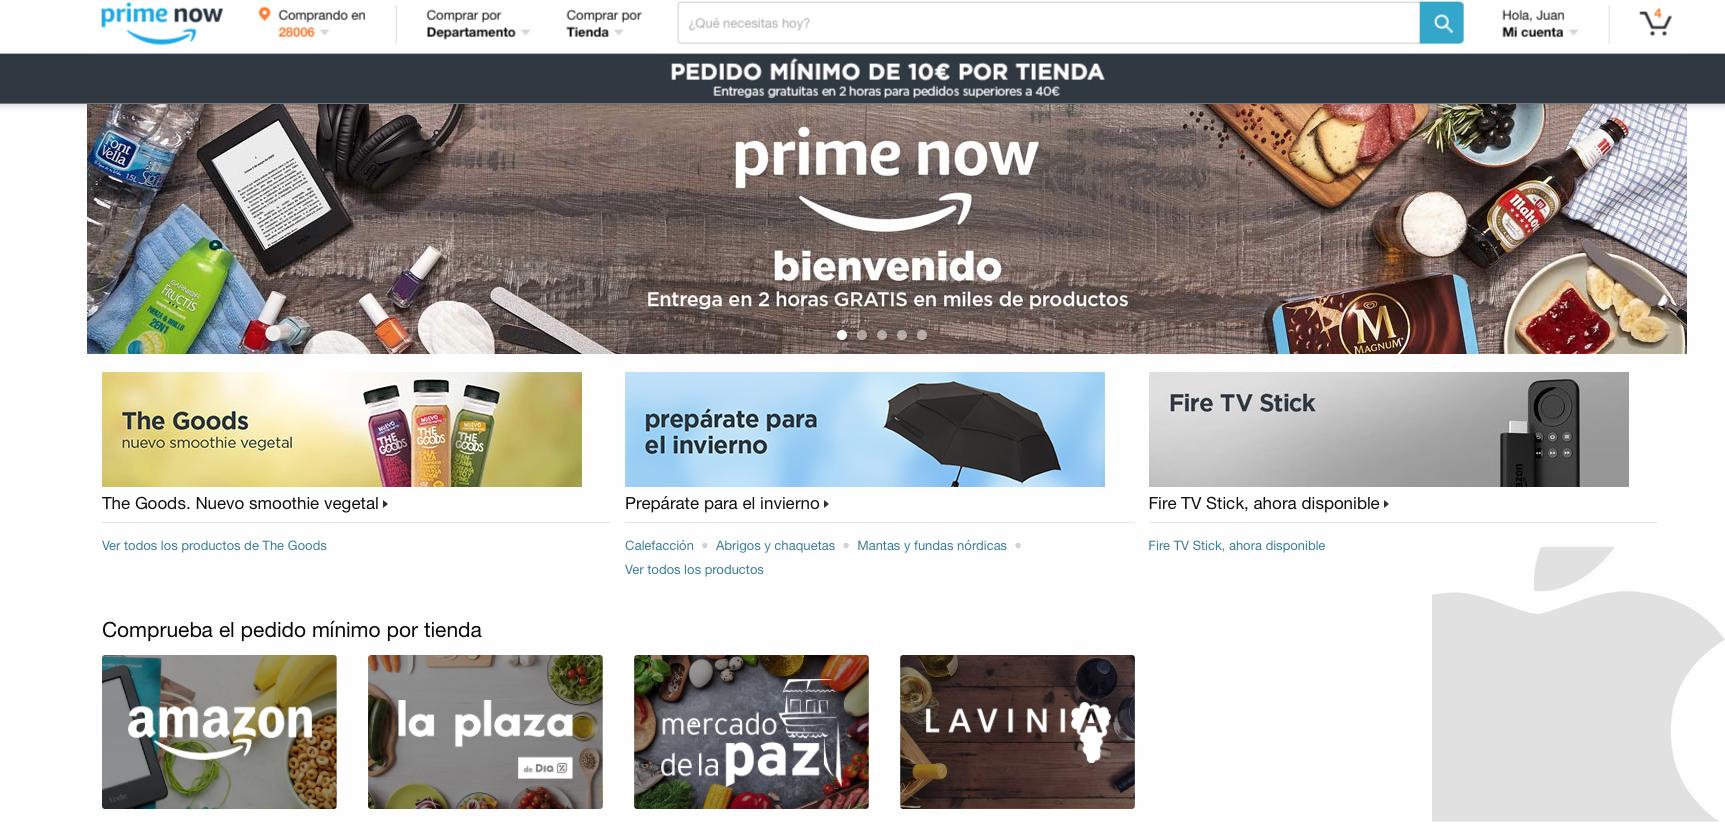 Precio Amazon Prime Now